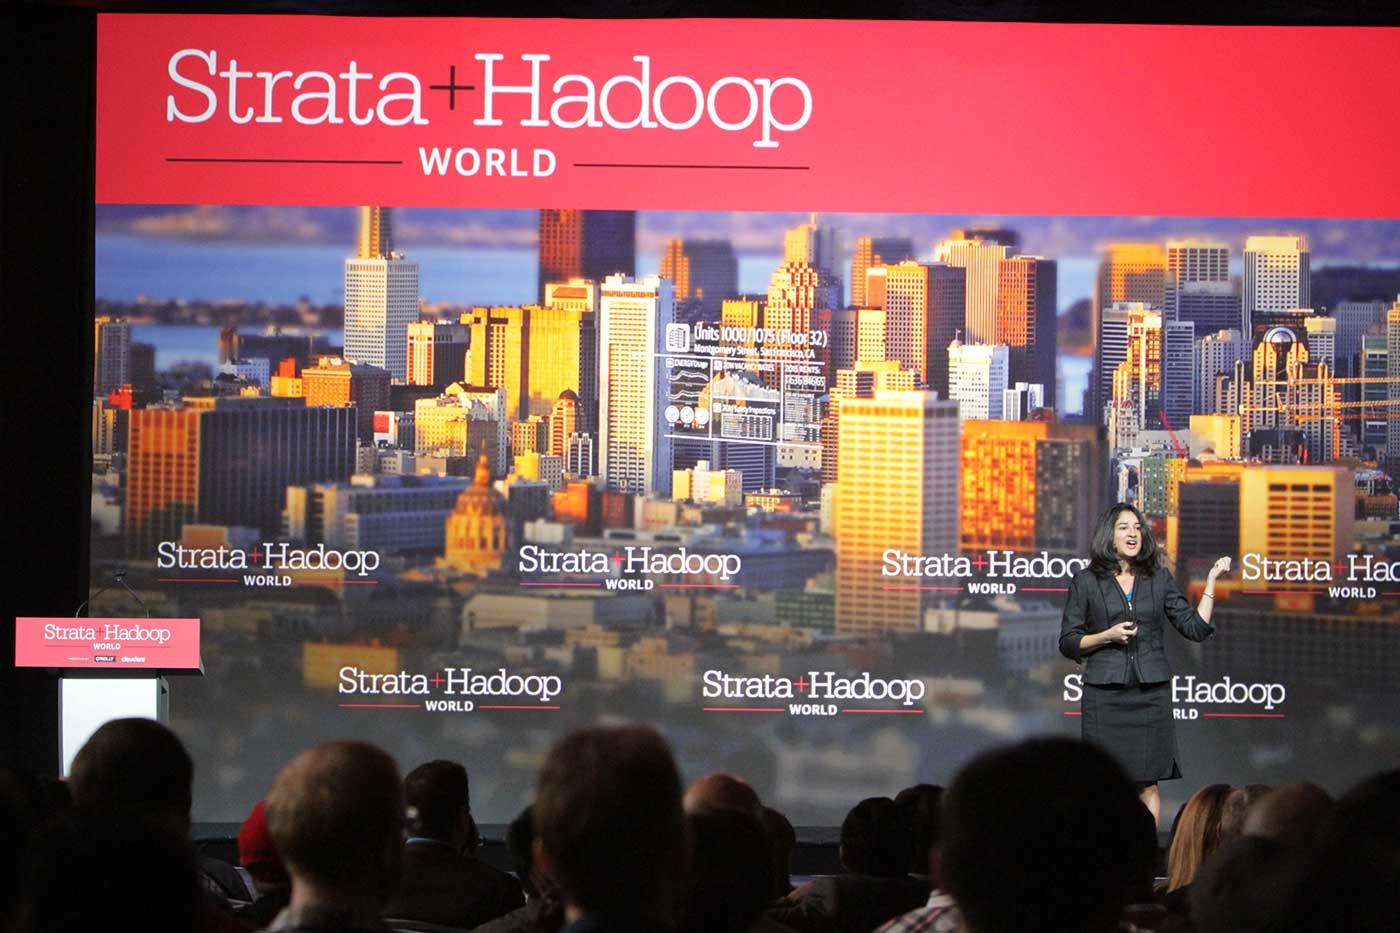 Strata + Hadoop World keynote stage.